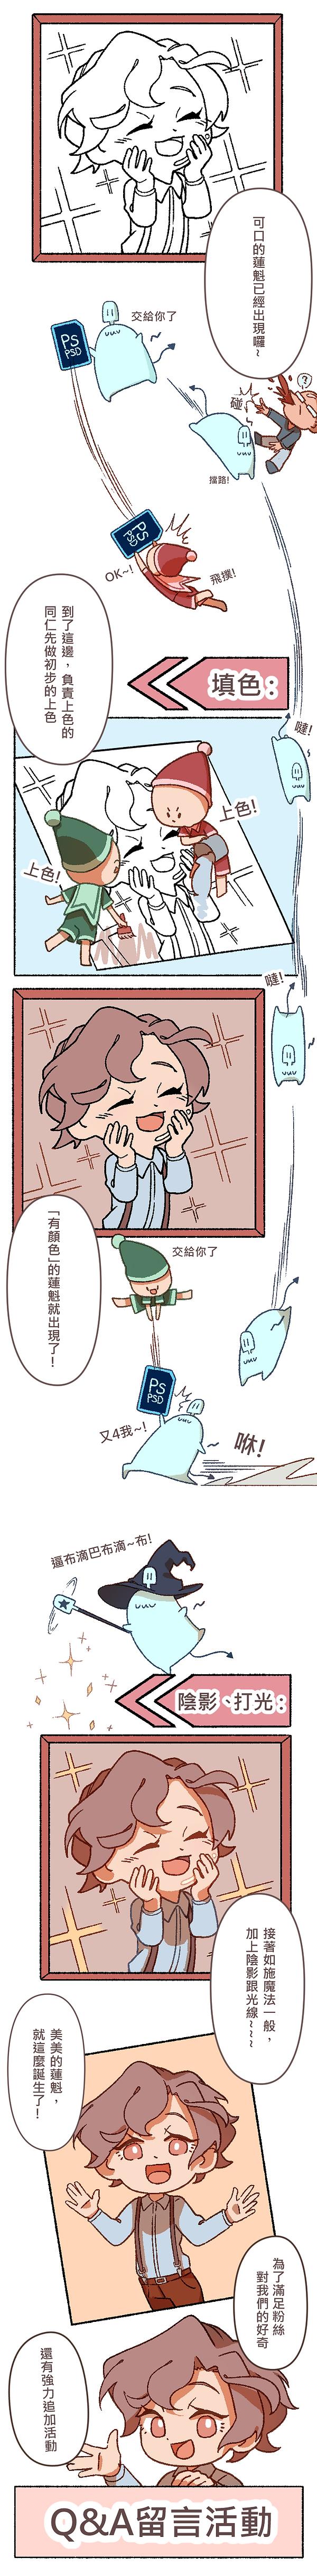 12 元旦特別篇-2.png